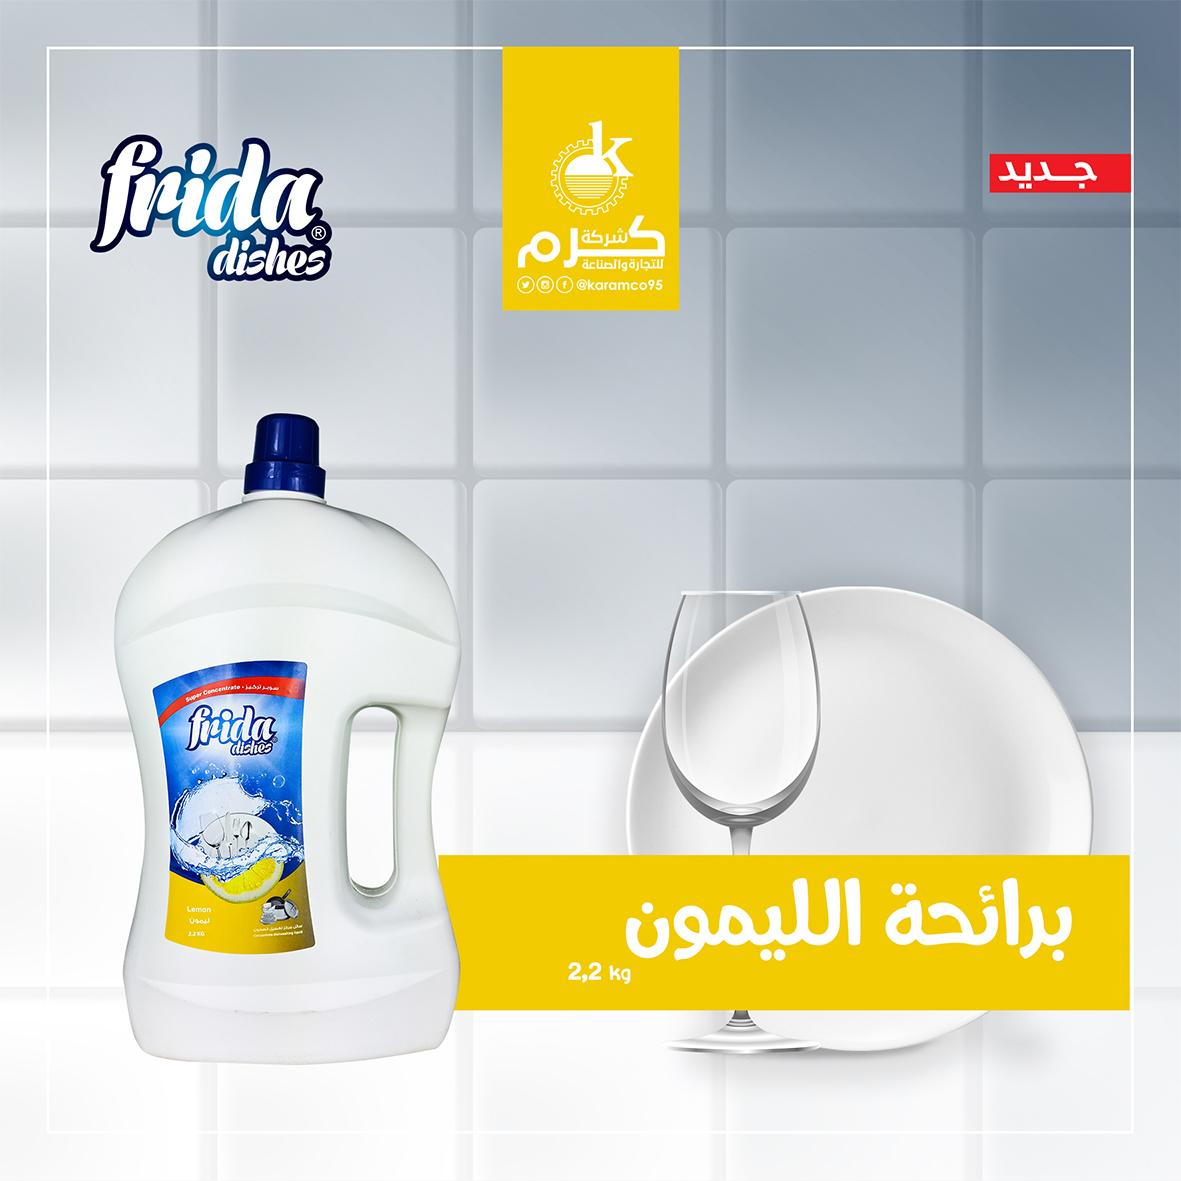 Frida Dishes (Lemon Smell) 2.2 Kg